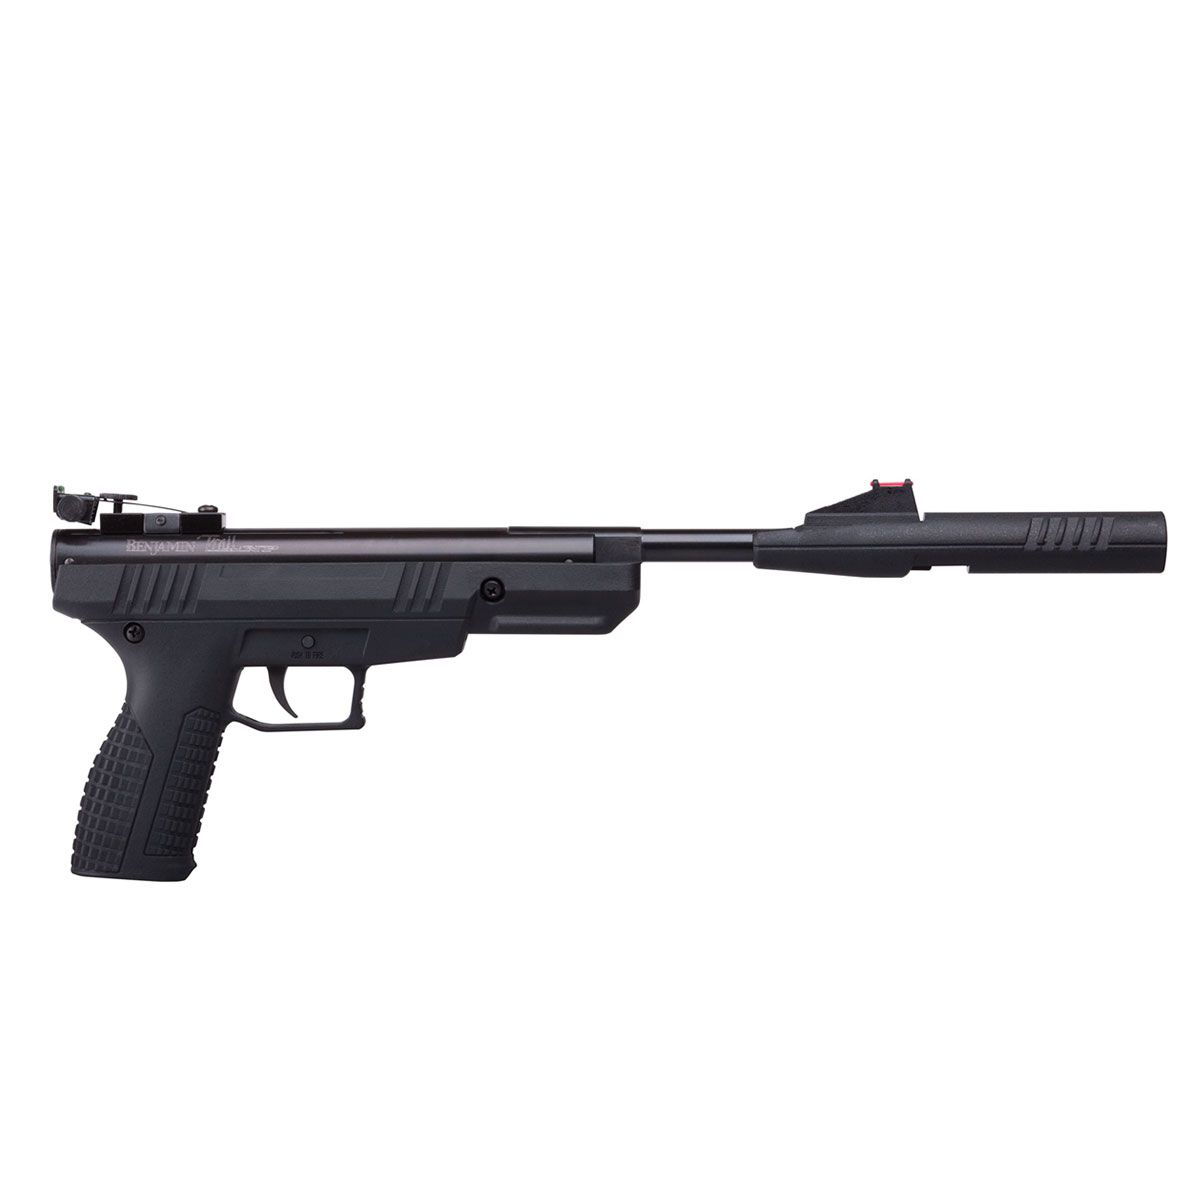 Pistola de Pressão Crosman BBP77 Calibre 4,5mm